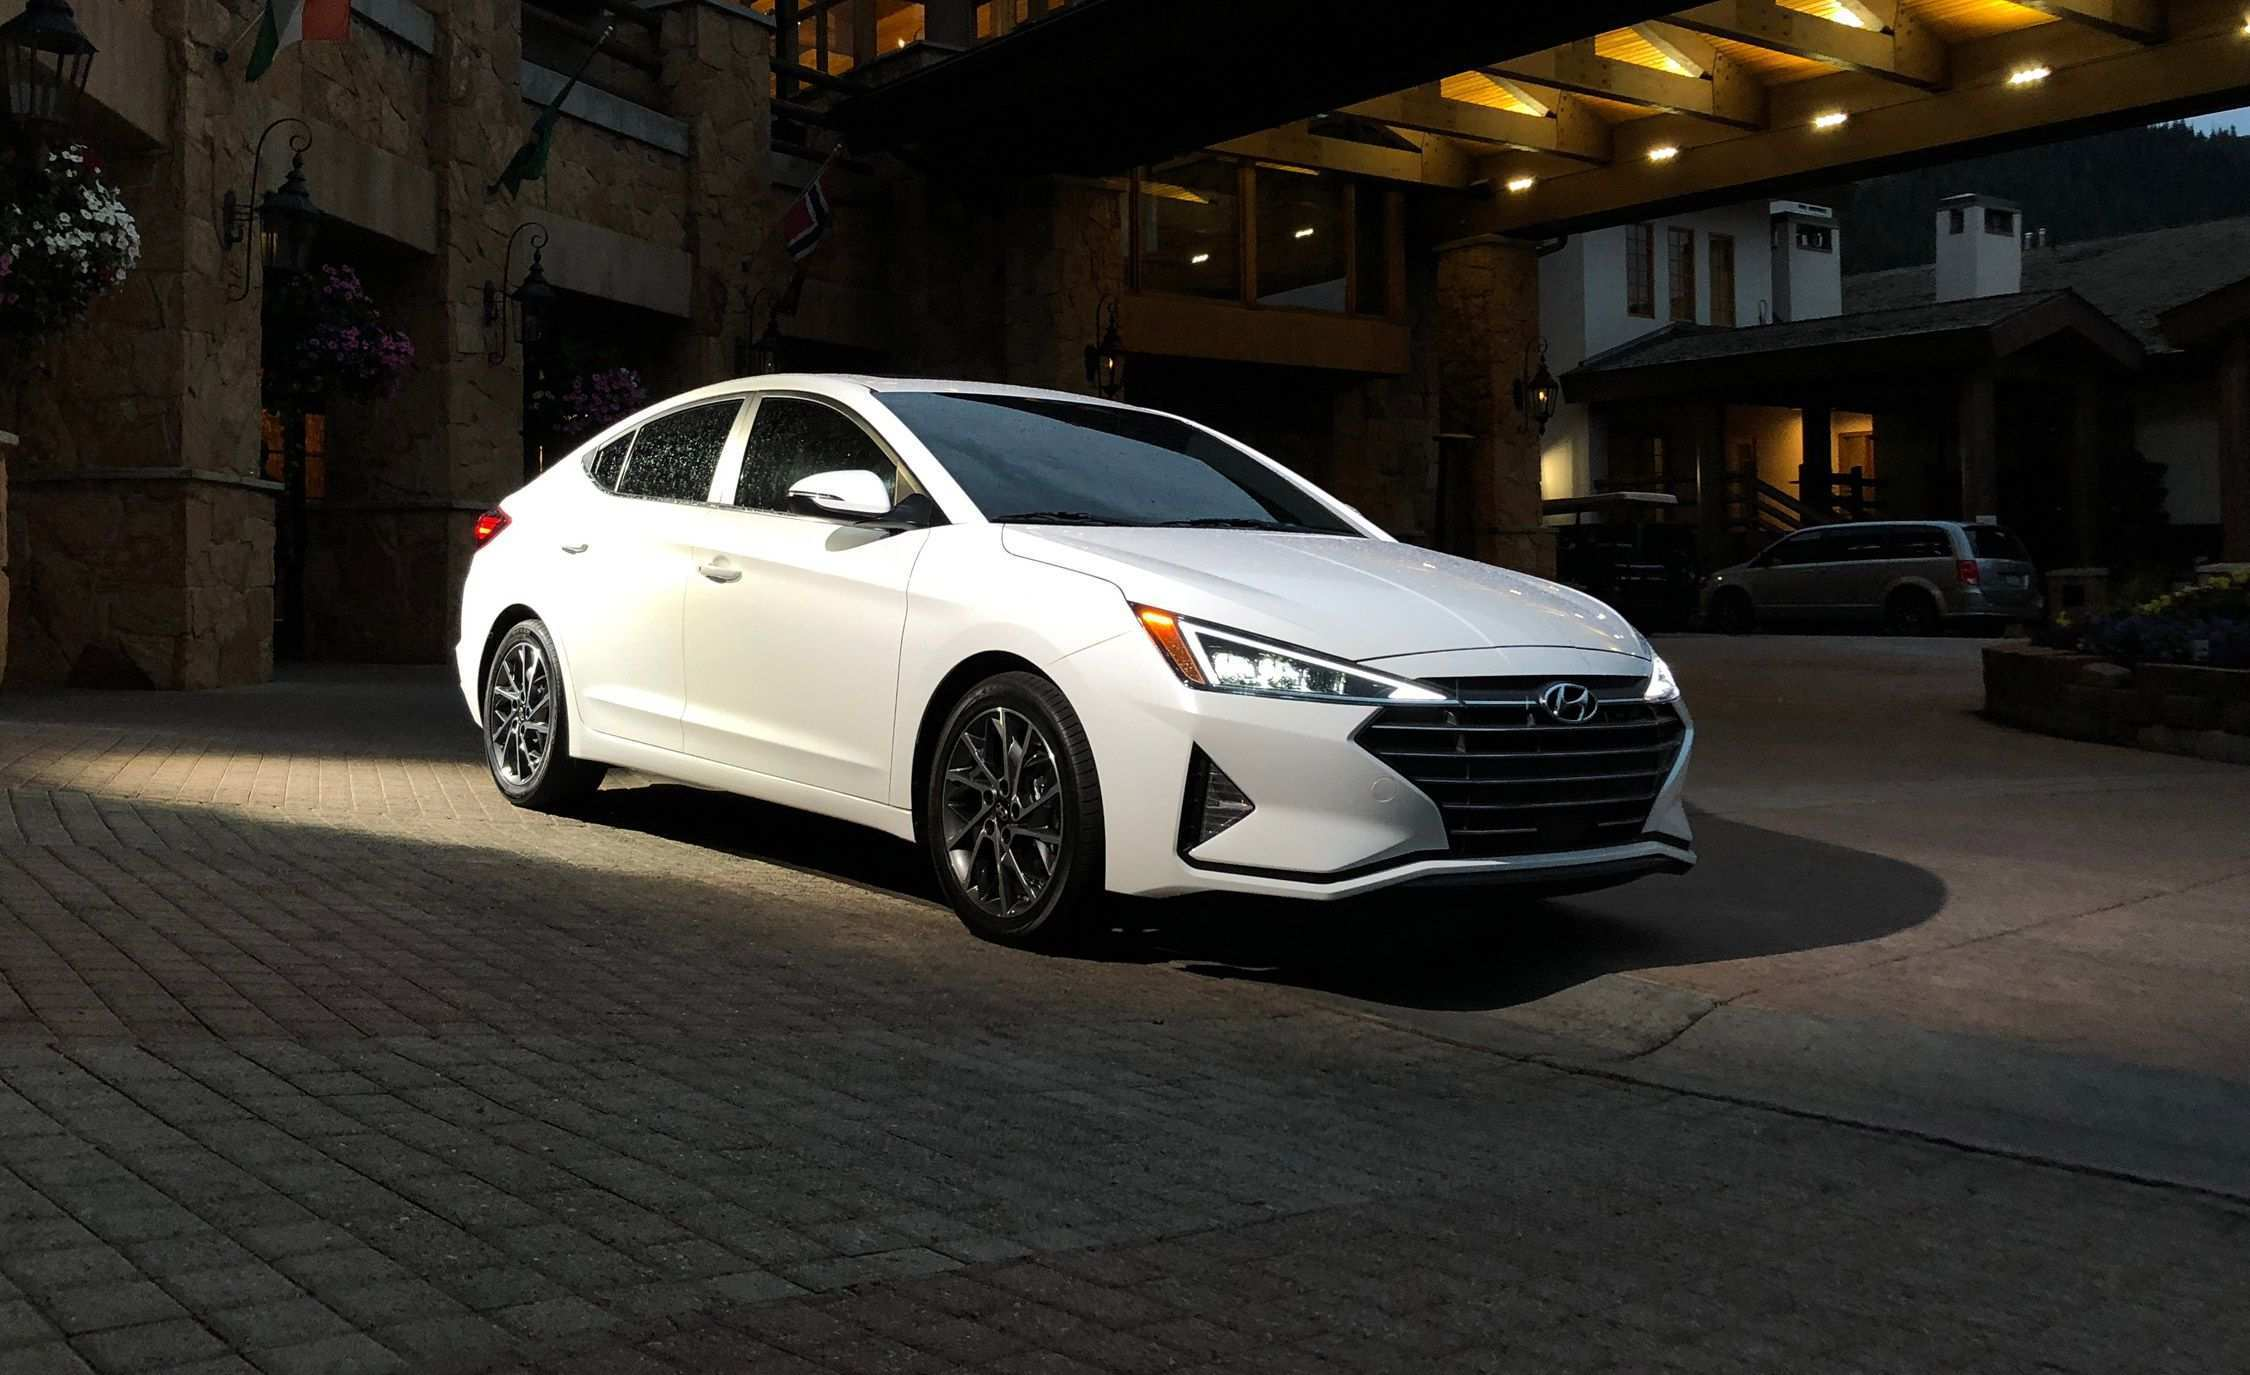 30 Great 2019 Hyundai Elantra Release for 2019 Hyundai Elantra